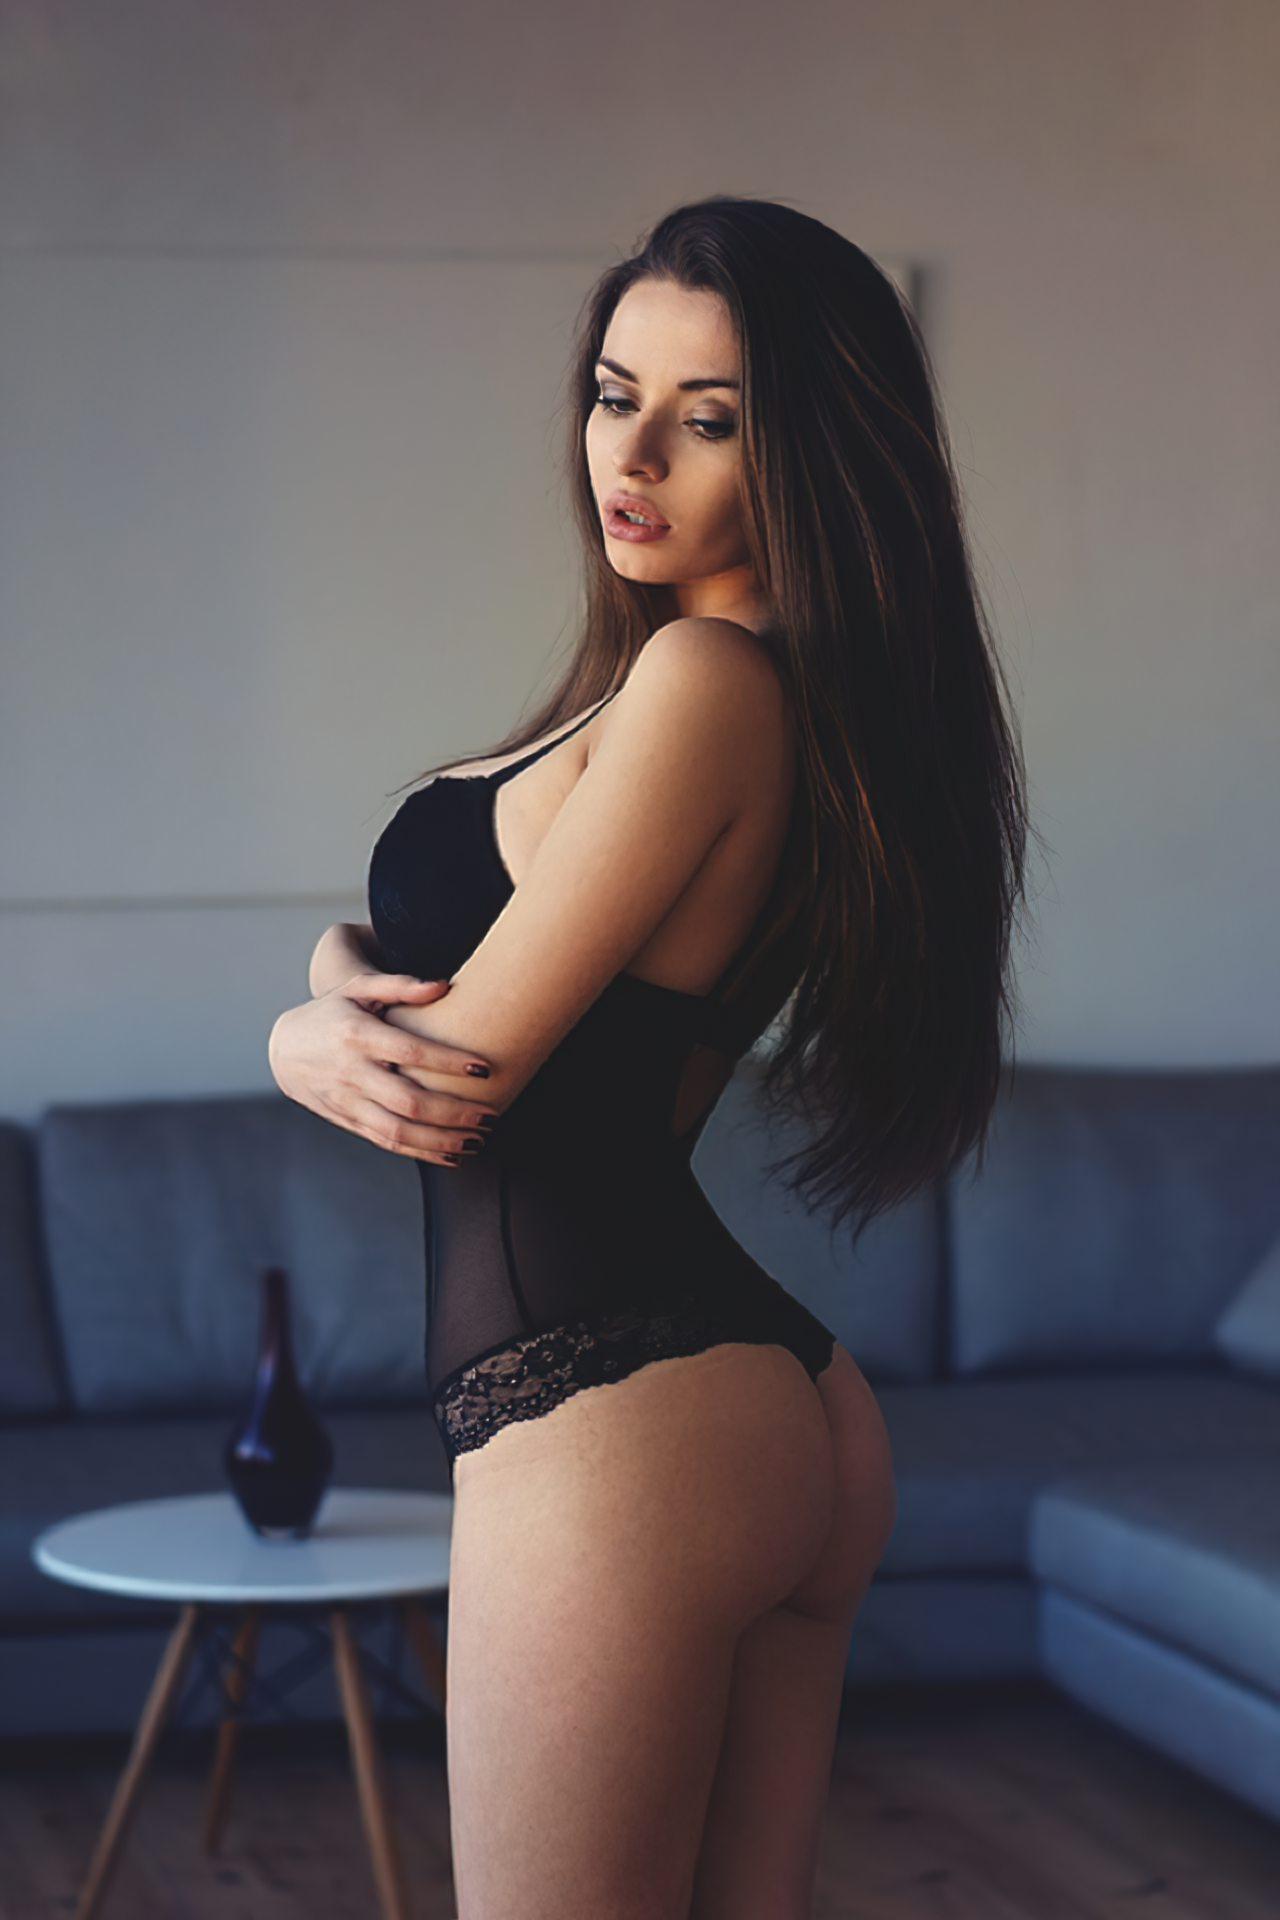 Fotos de Mulheres (42)